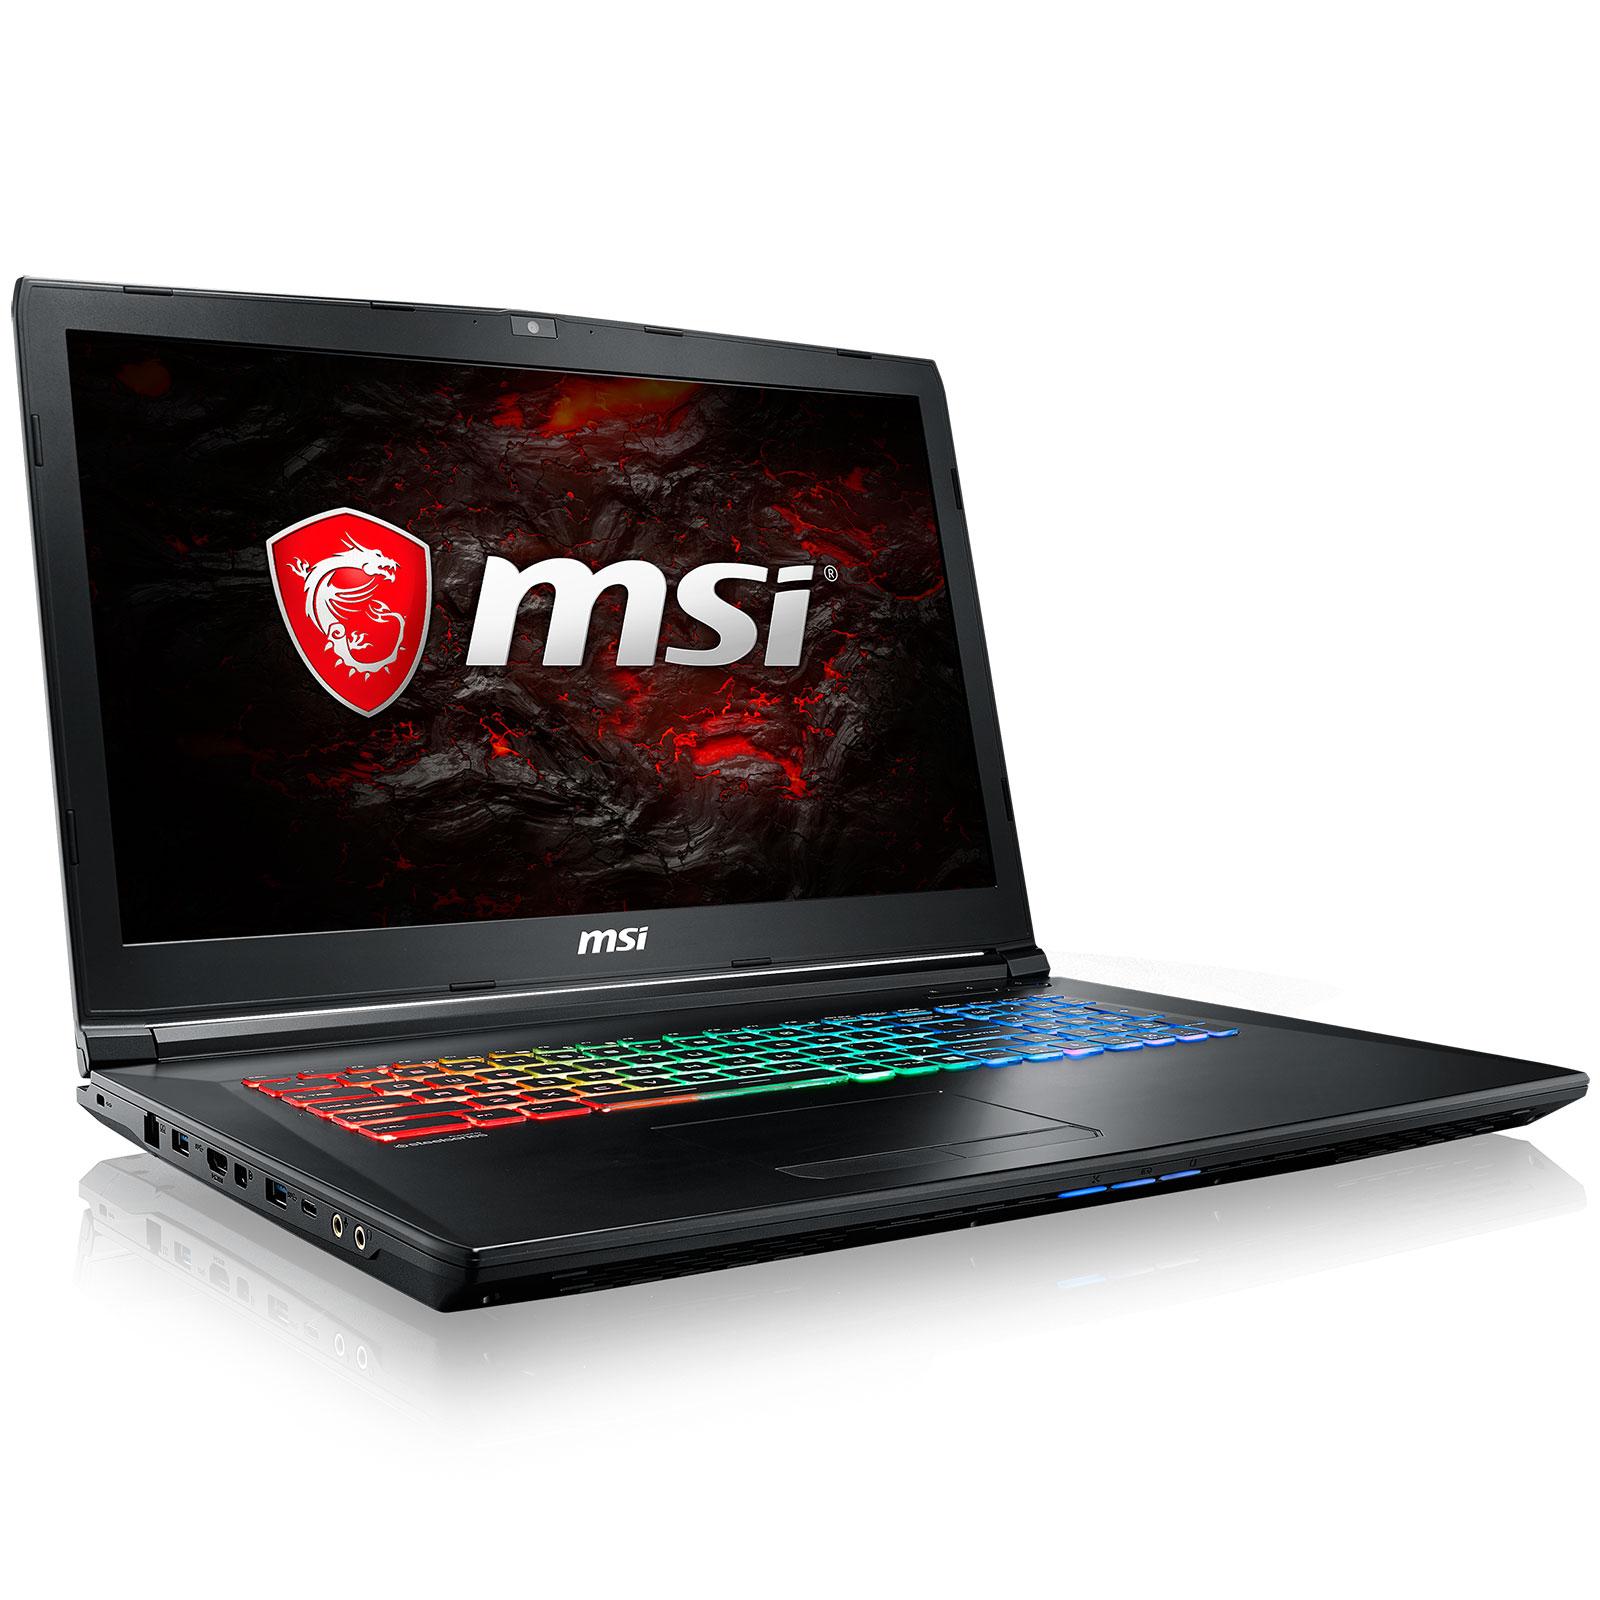 "PC portable MSI GP72VR 7RFX-623XFR Leopard Pro Intel Core i7-7700HQ 16 Go SSD 256 Go + HDD 1 To 17.3"" LED Full HD NVIDIA GeForce GTX 1060 3 Go Graveur DVD Wi-Fi AC/Bluetooth Webcam FreeDOS (garantie constructeur 2 ans)"